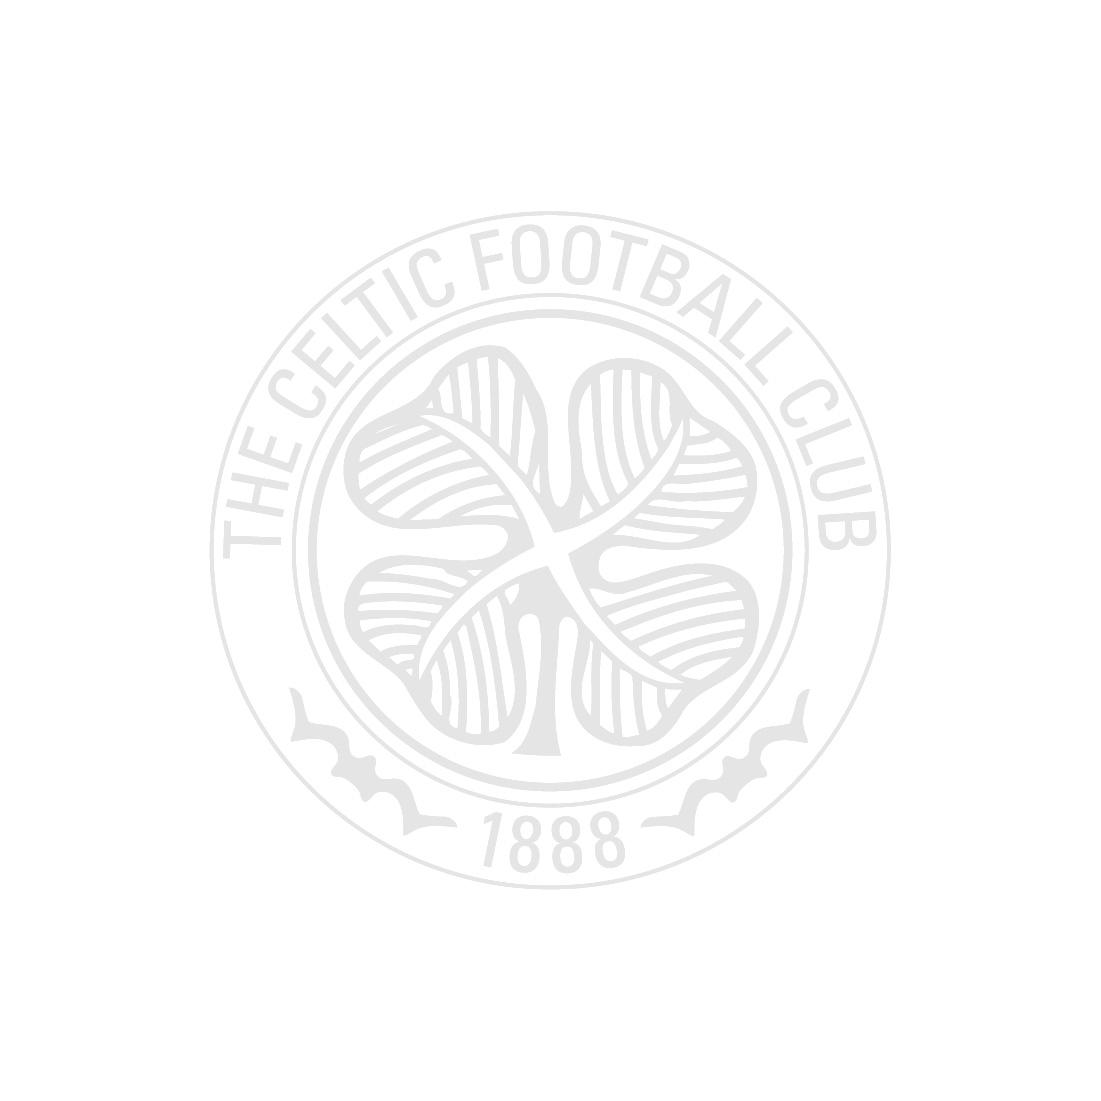 Official Celtic 2021 Calendar